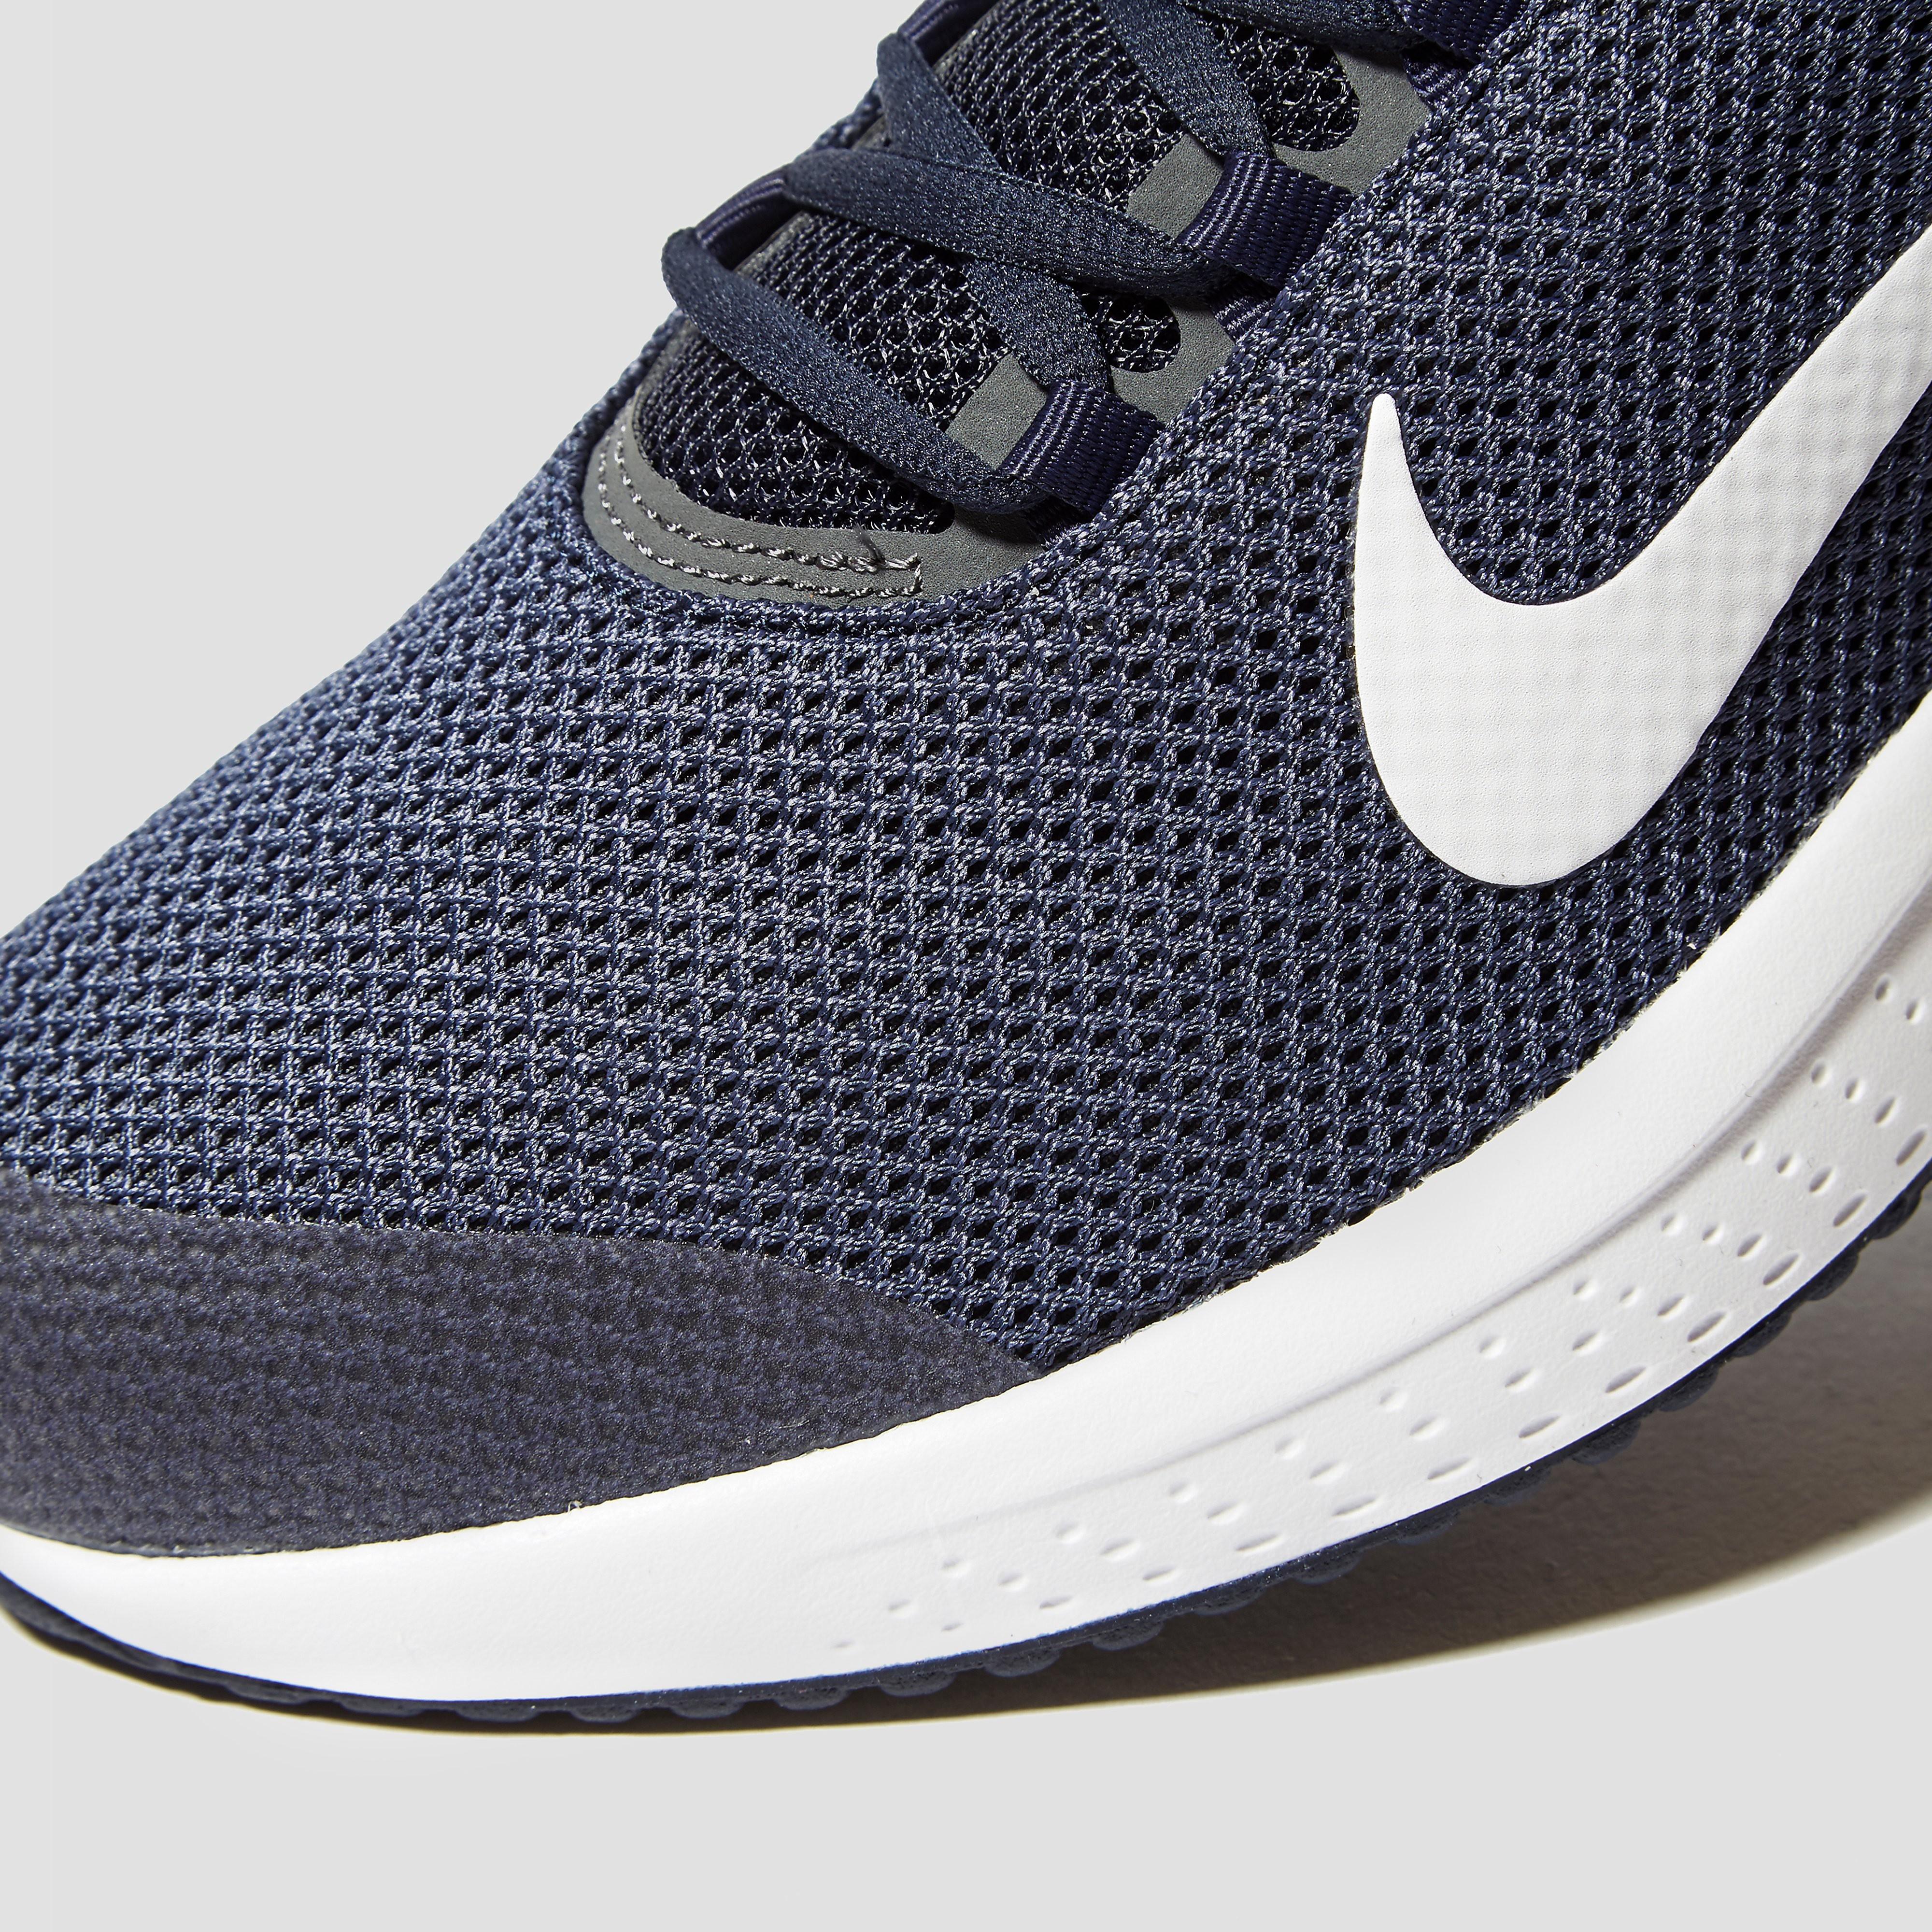 Nike Run All Day Men's Running Shoes